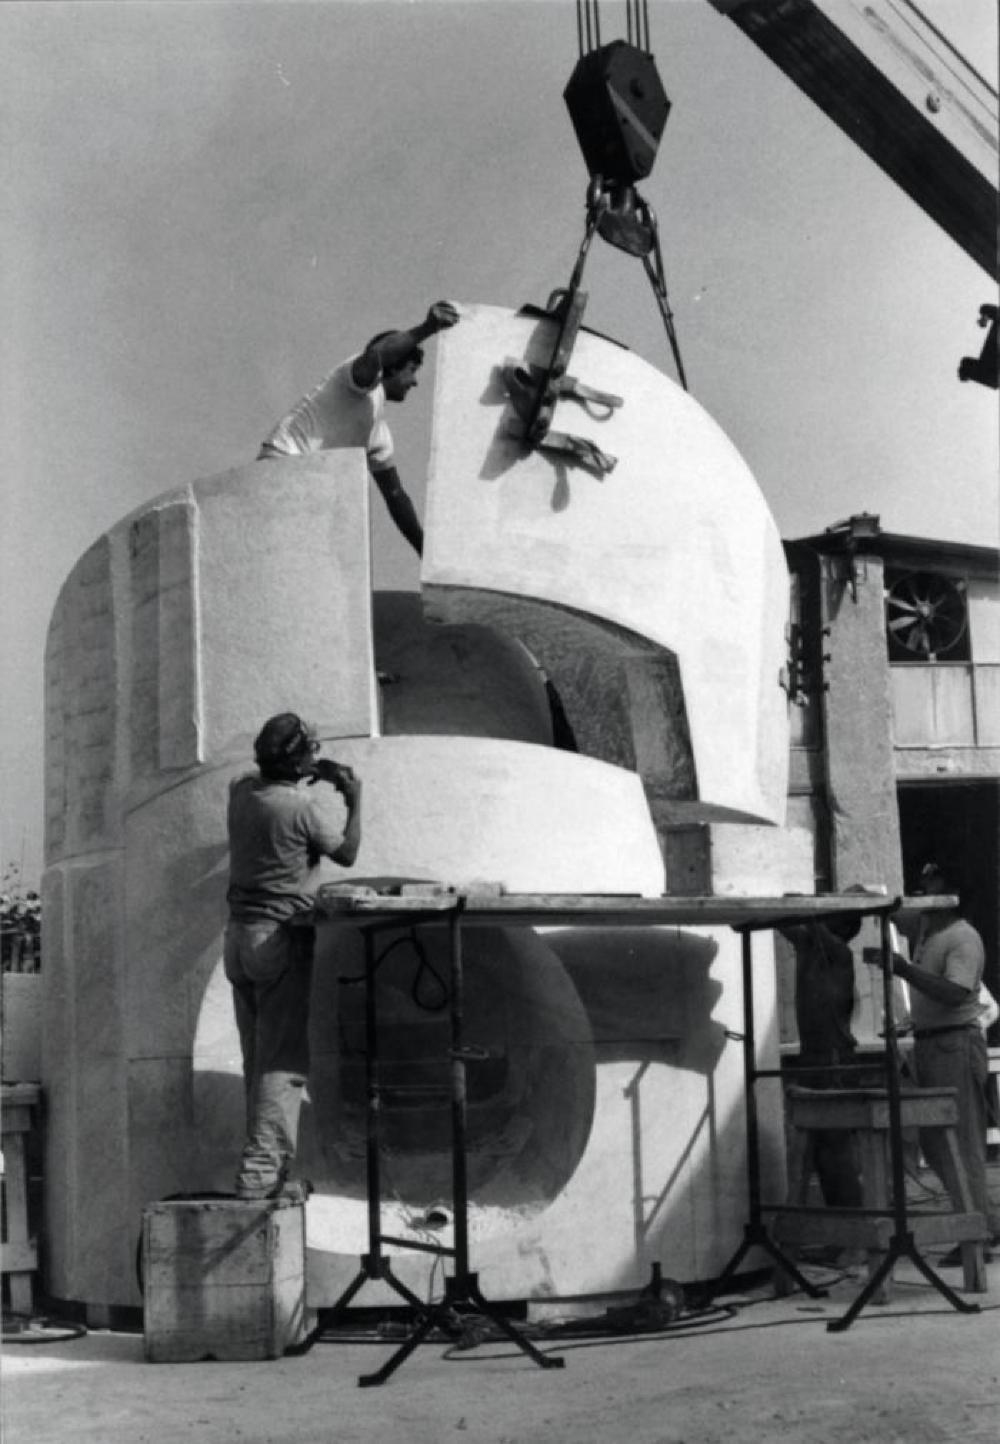 The construction of Slide Mantra in Venice/Pietrasanta